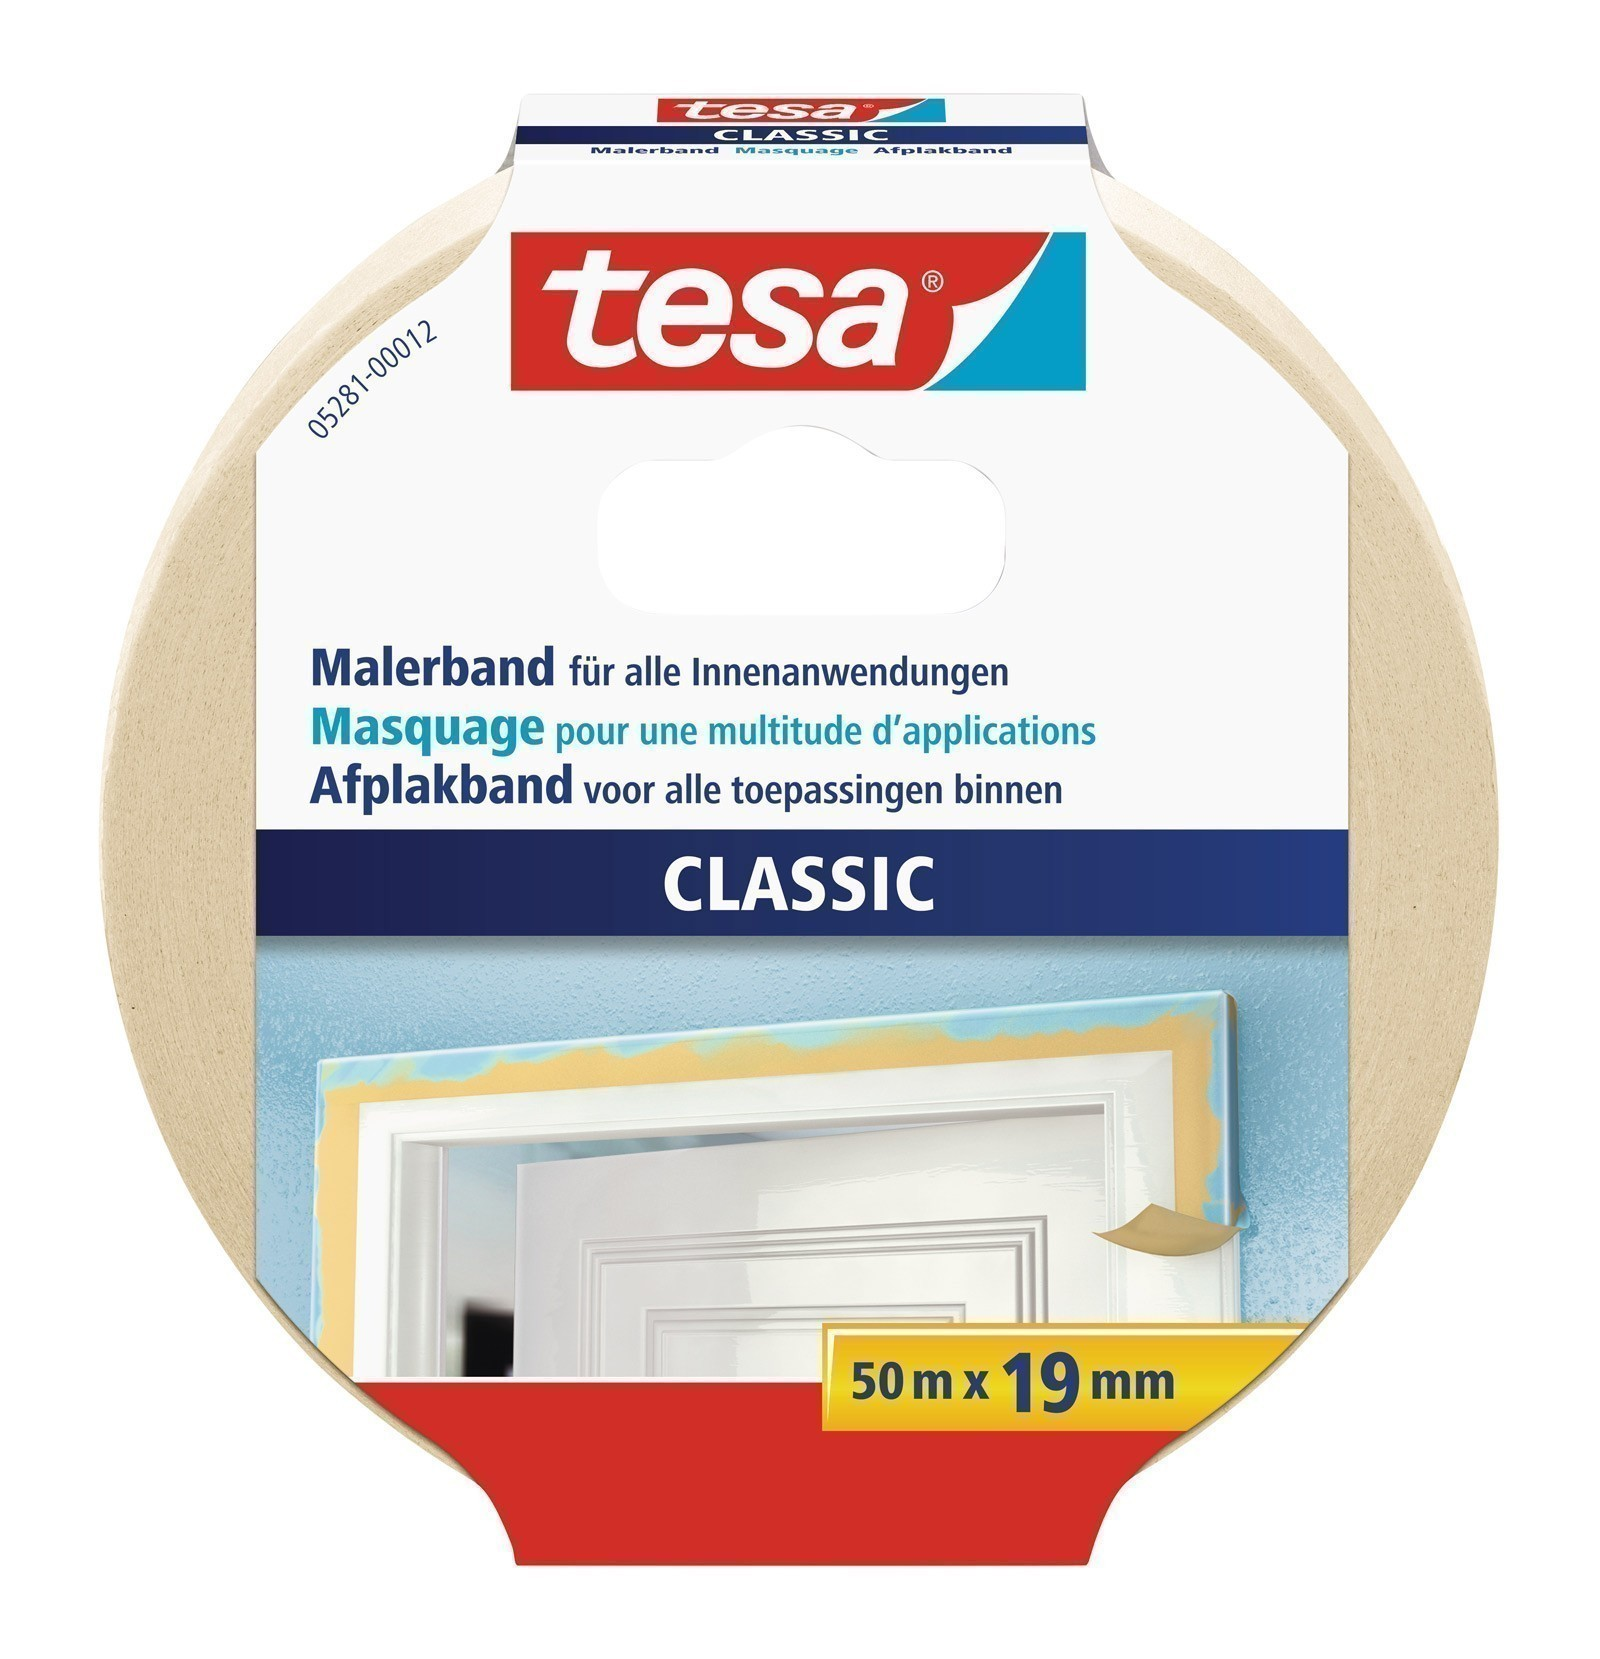 tesa® Malerkrepp Premium Classic 50 m x 50 mm Bild 1